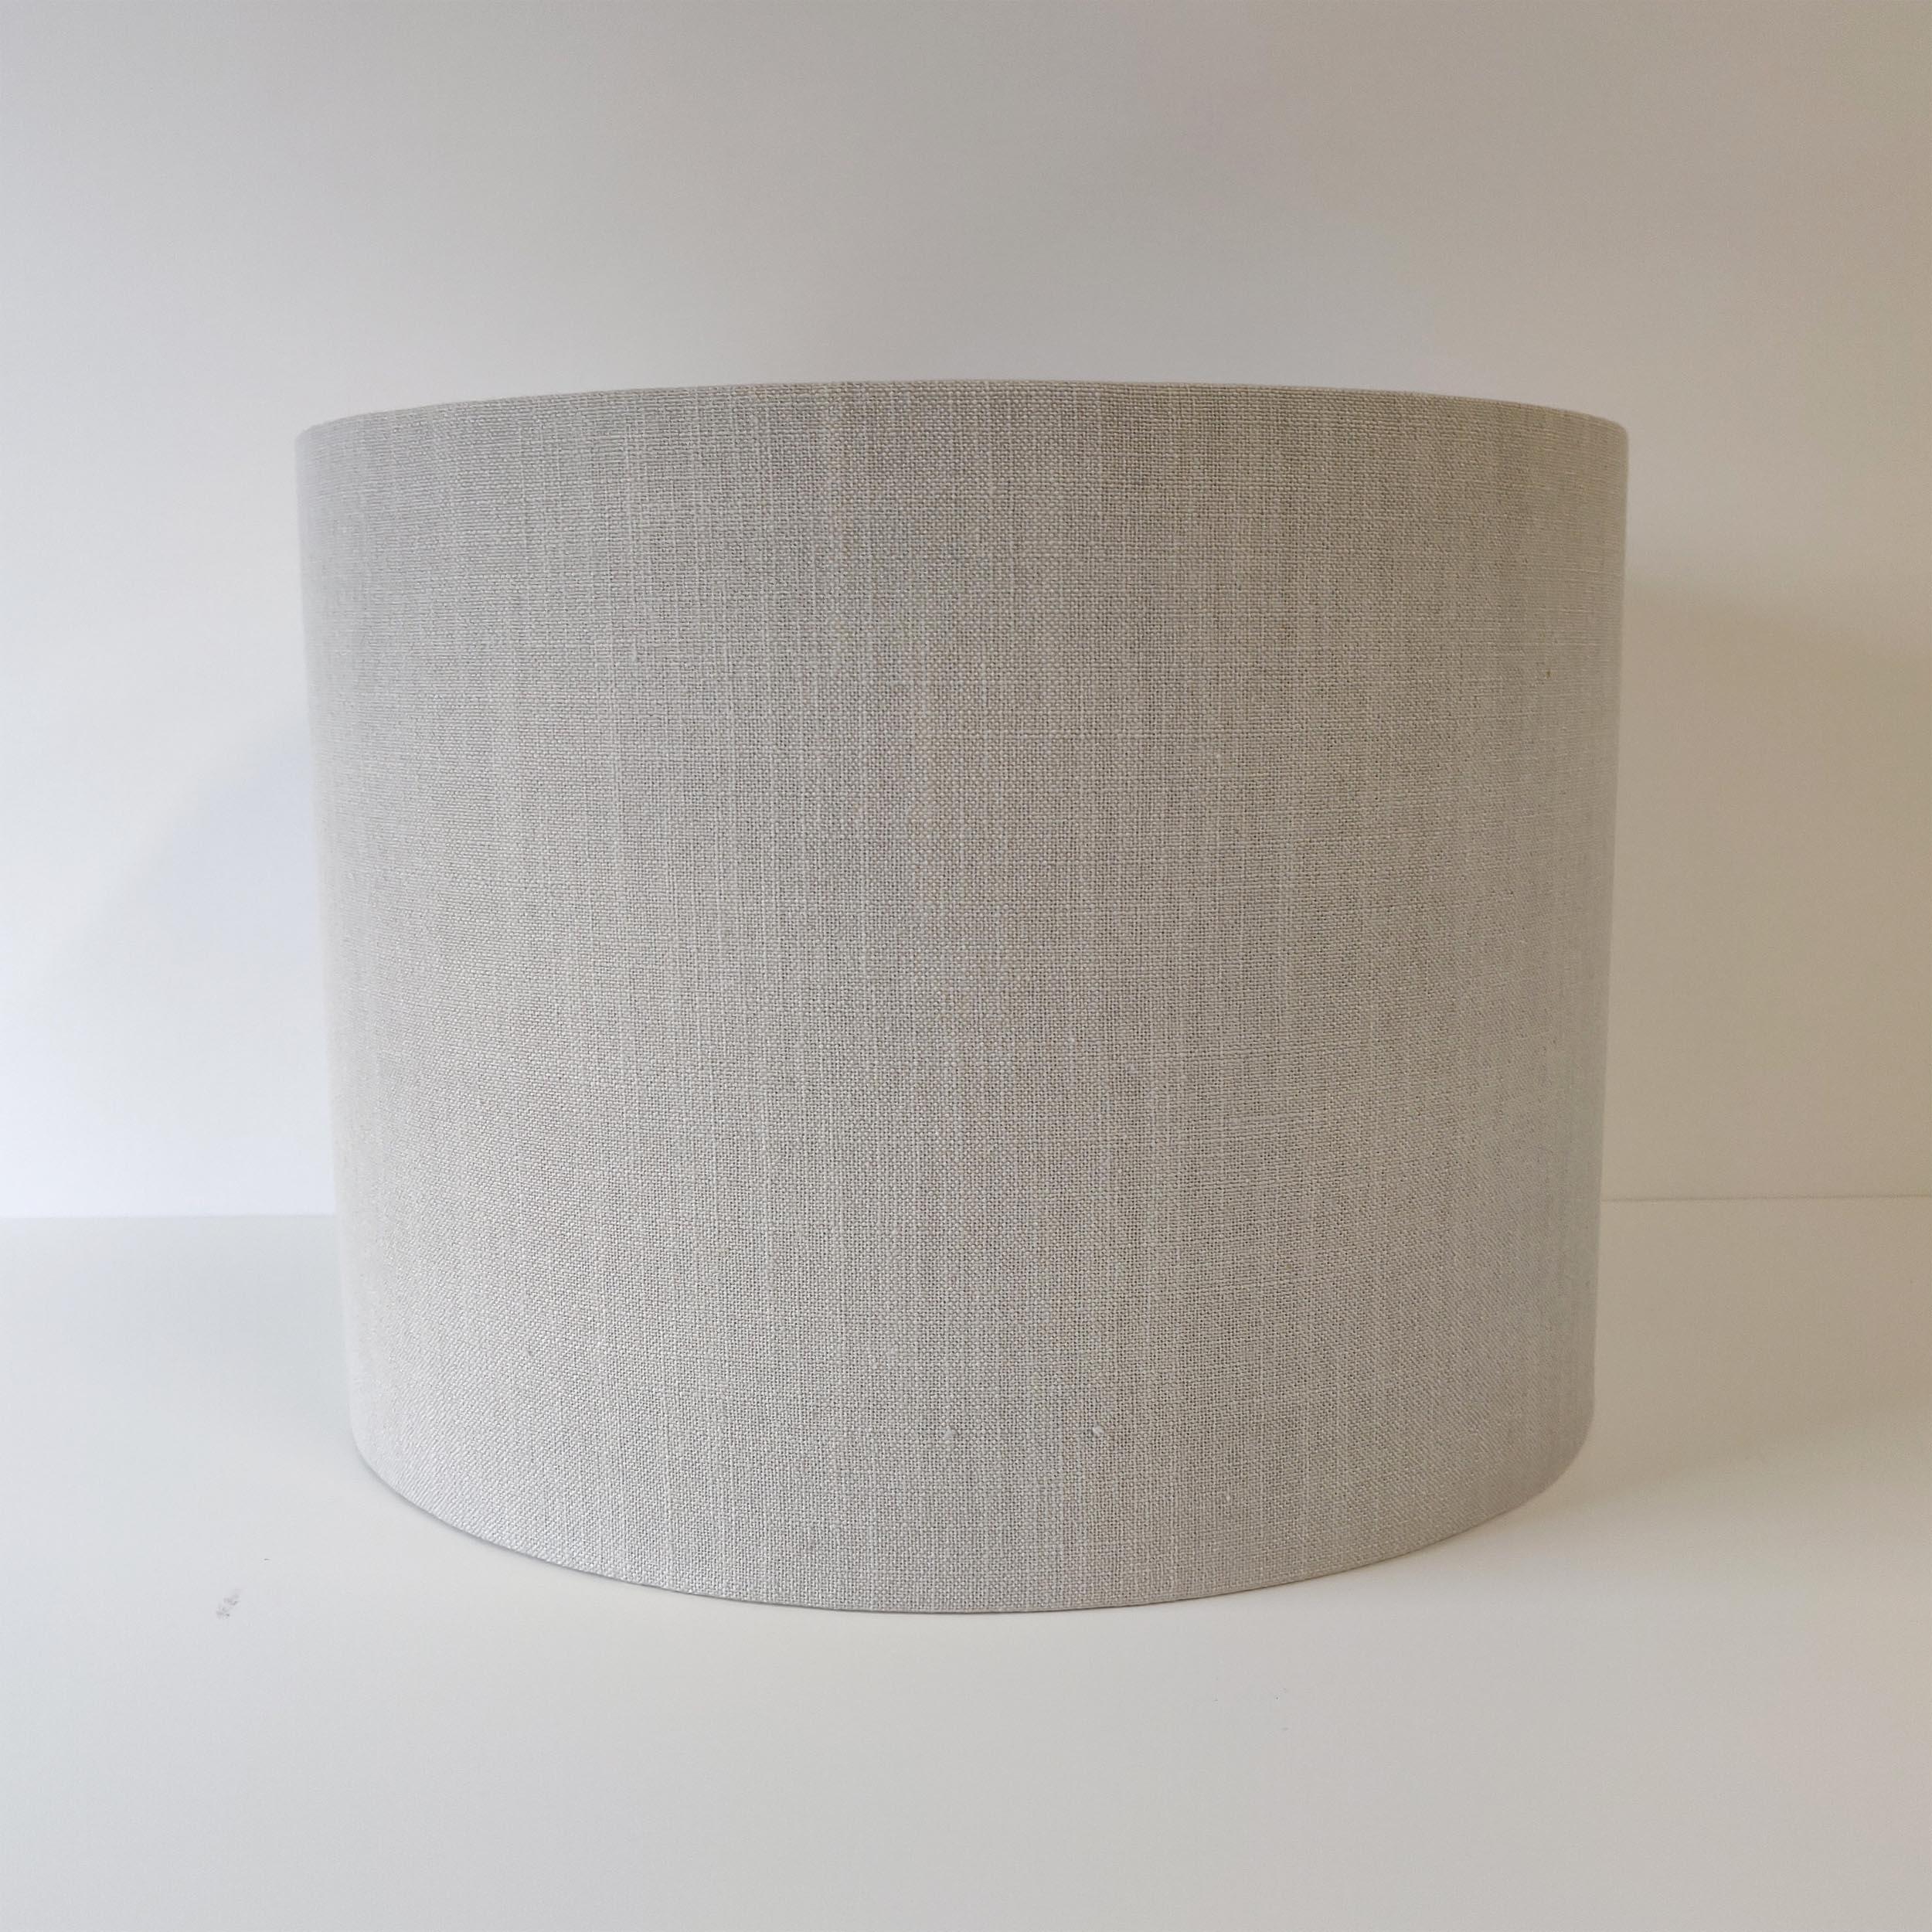 Light Grey Linen Lamp shade